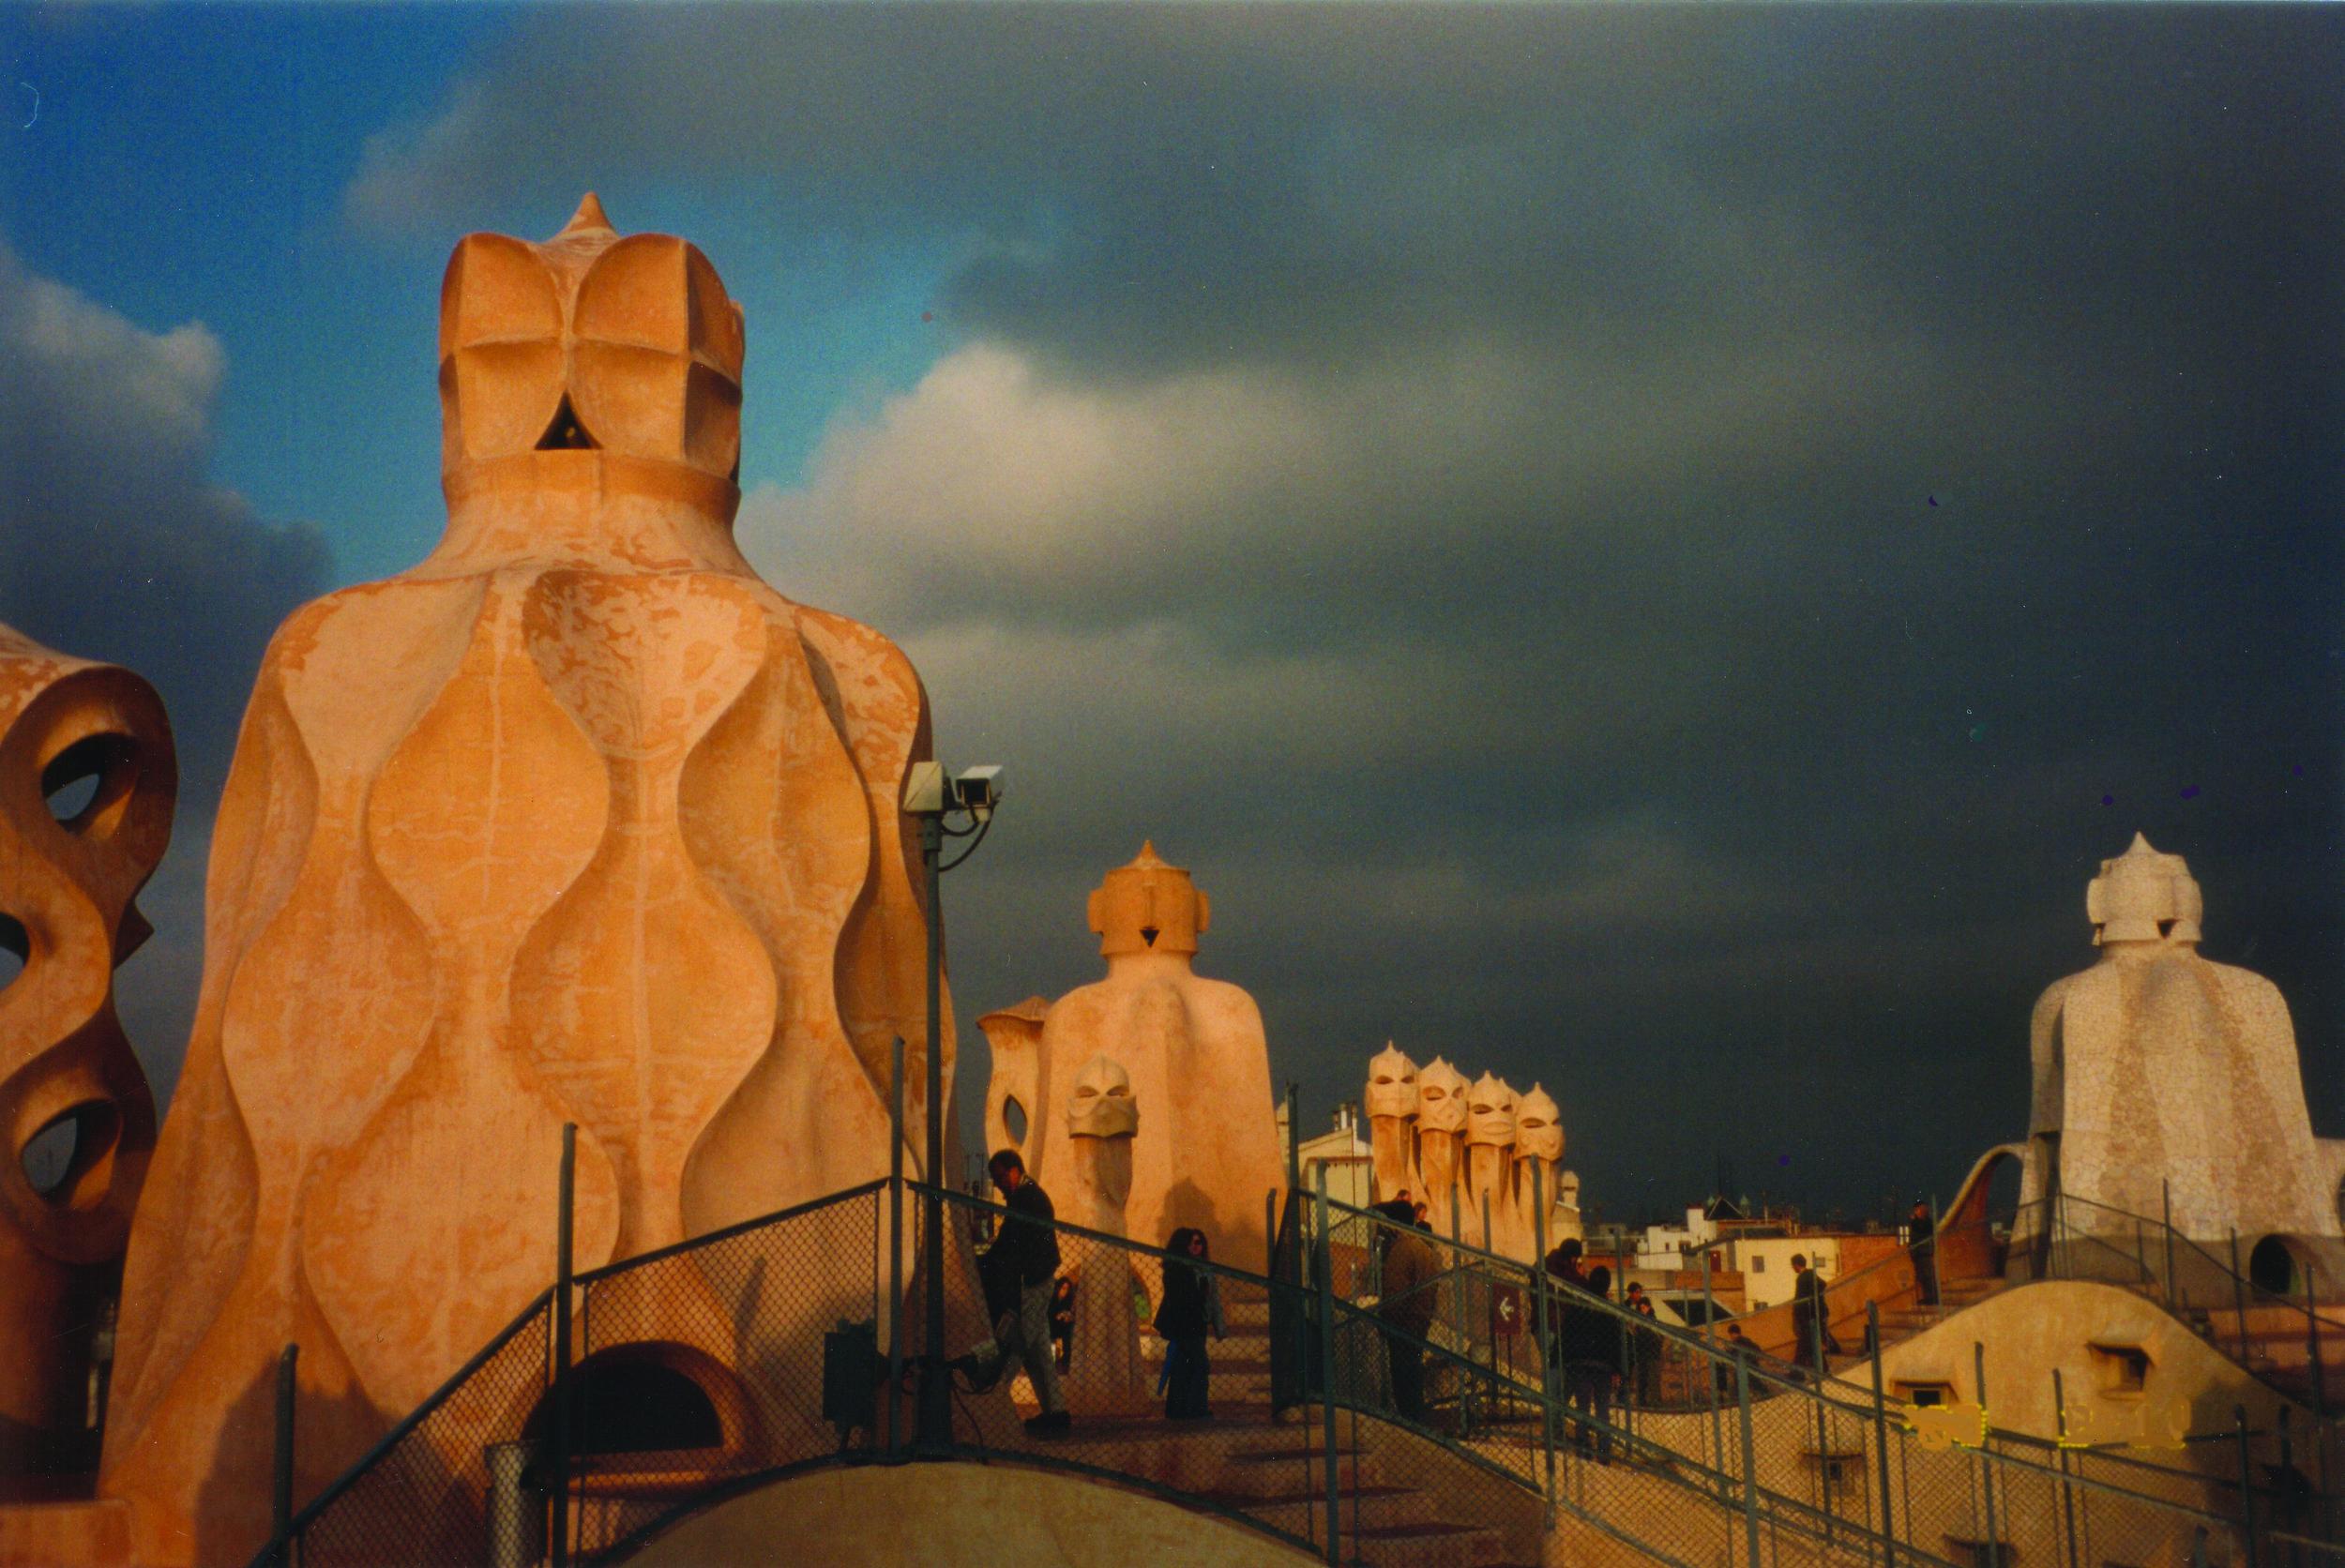 La Pedrera rooftop - Gaudi architecture.jpg